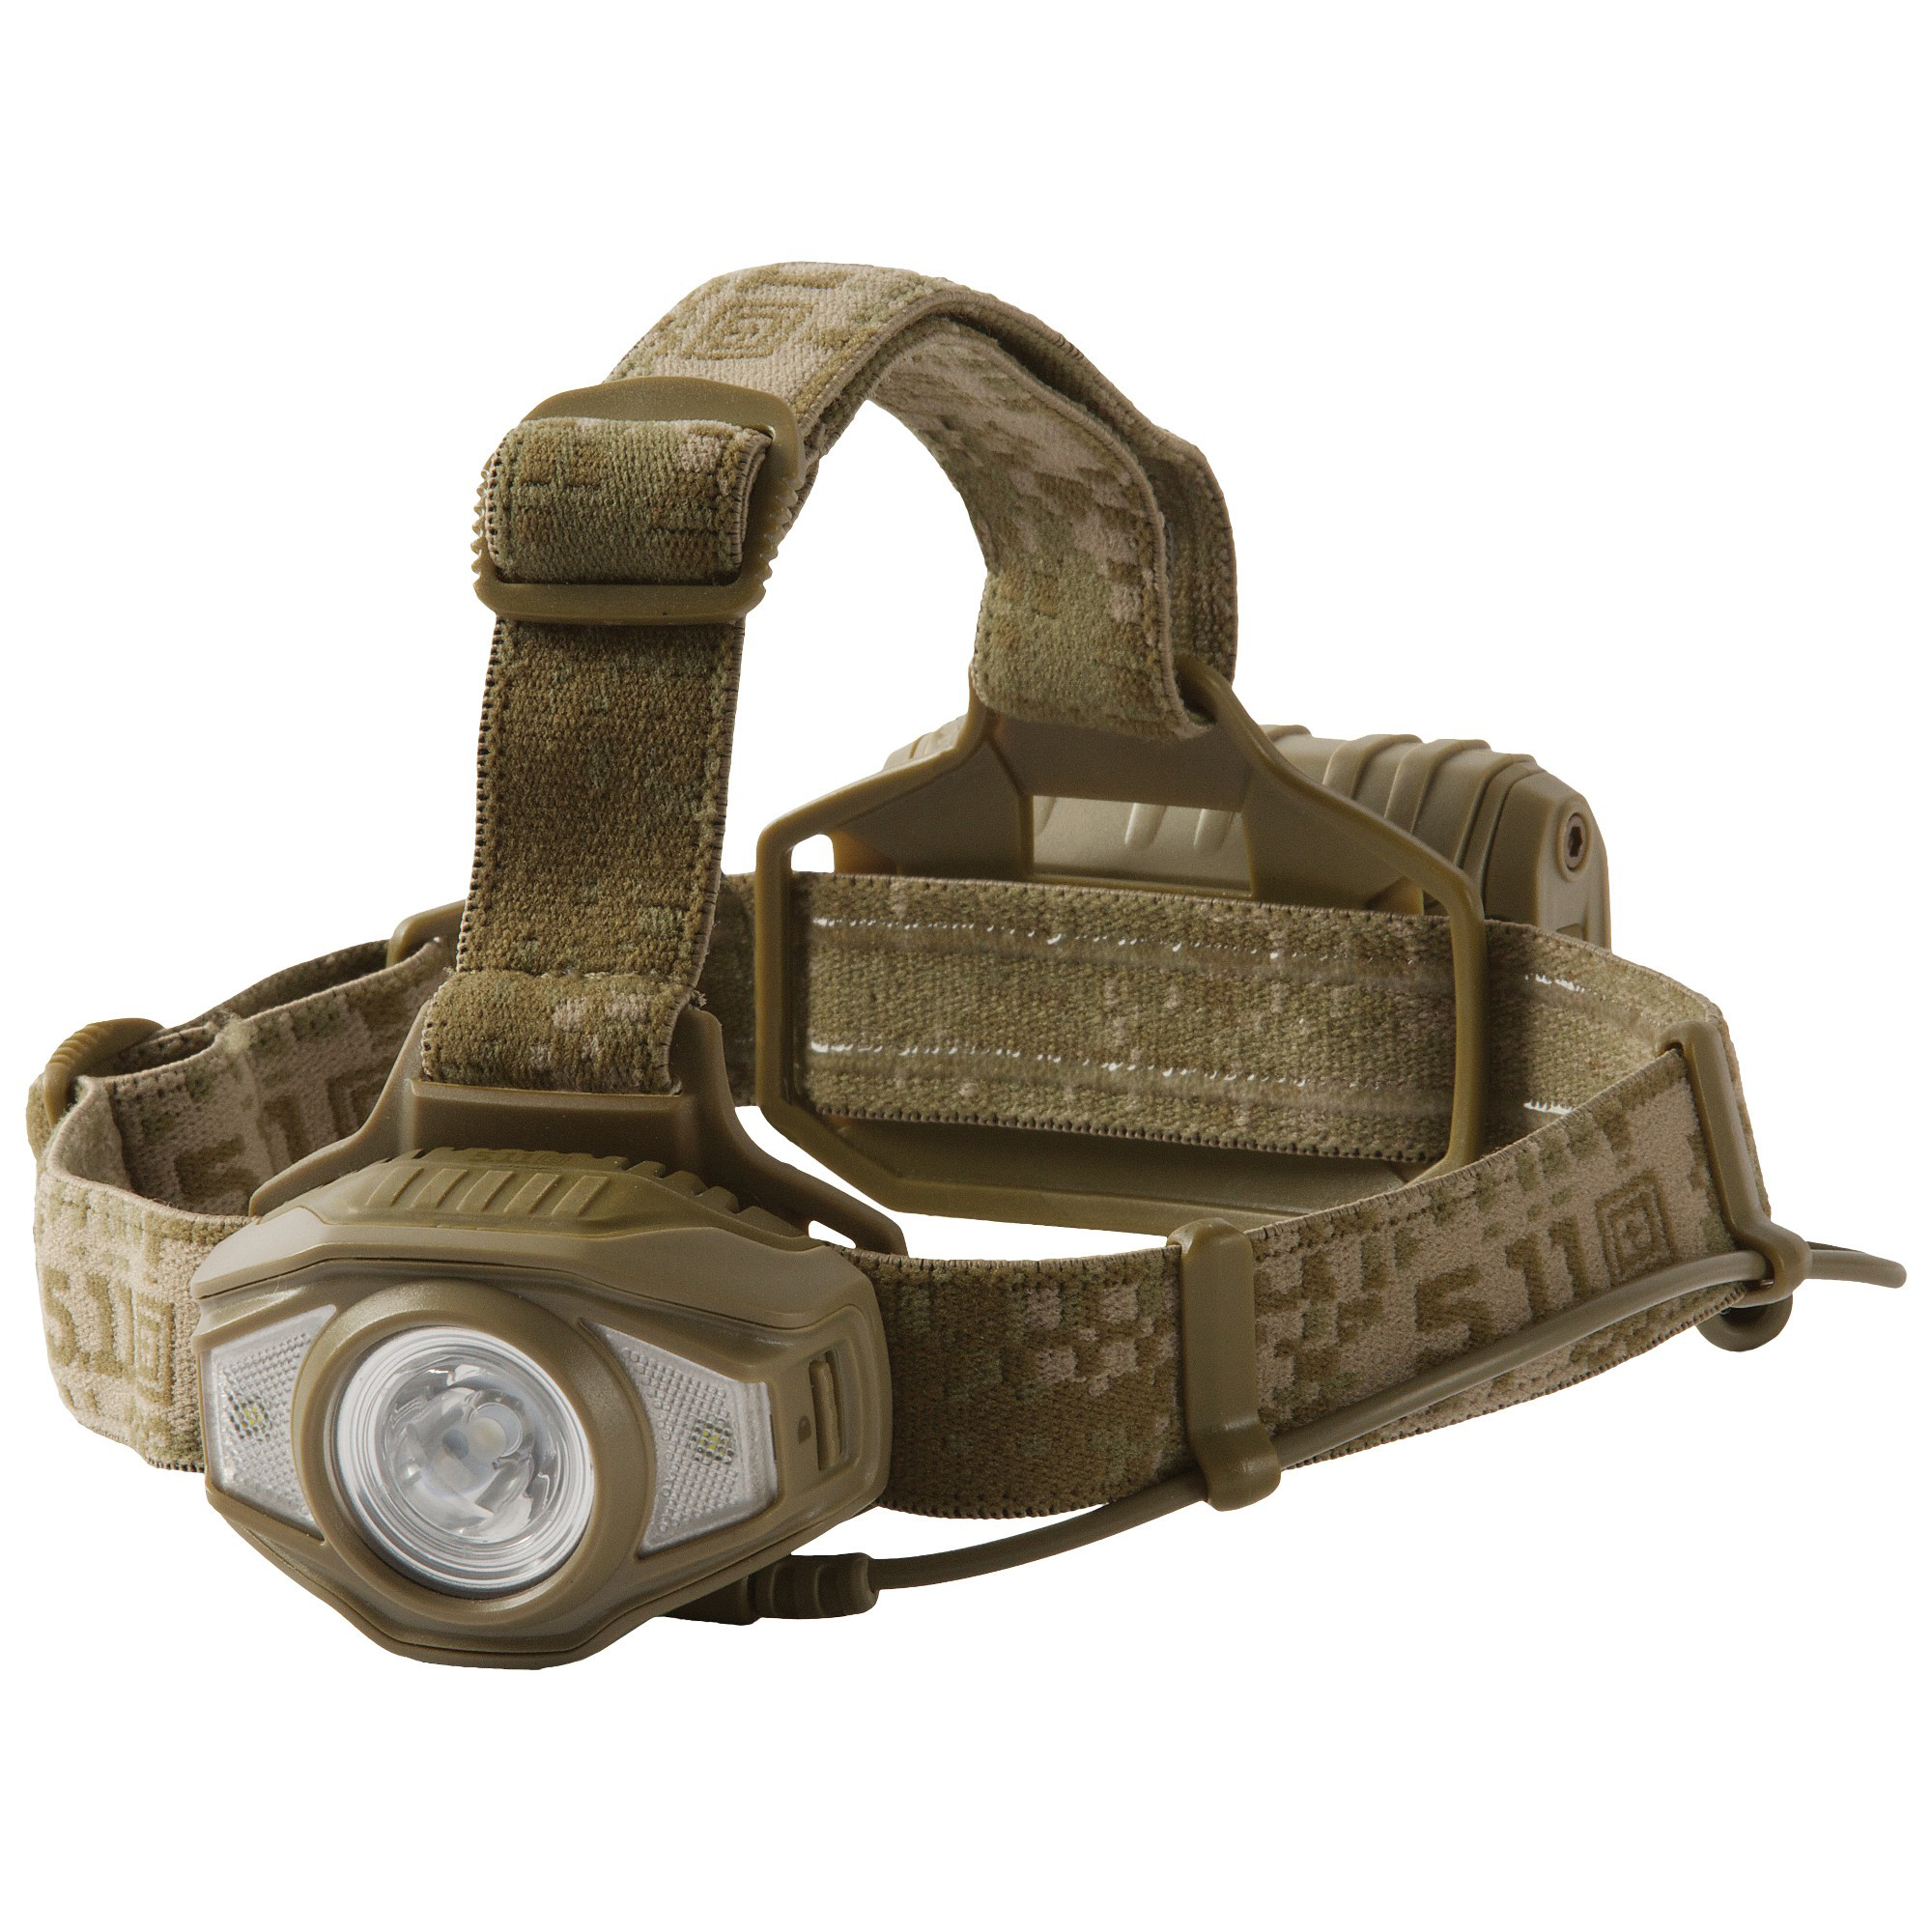 5.11 INC Tactical 5.11 Unisex Adult S+R H3 Headlamp